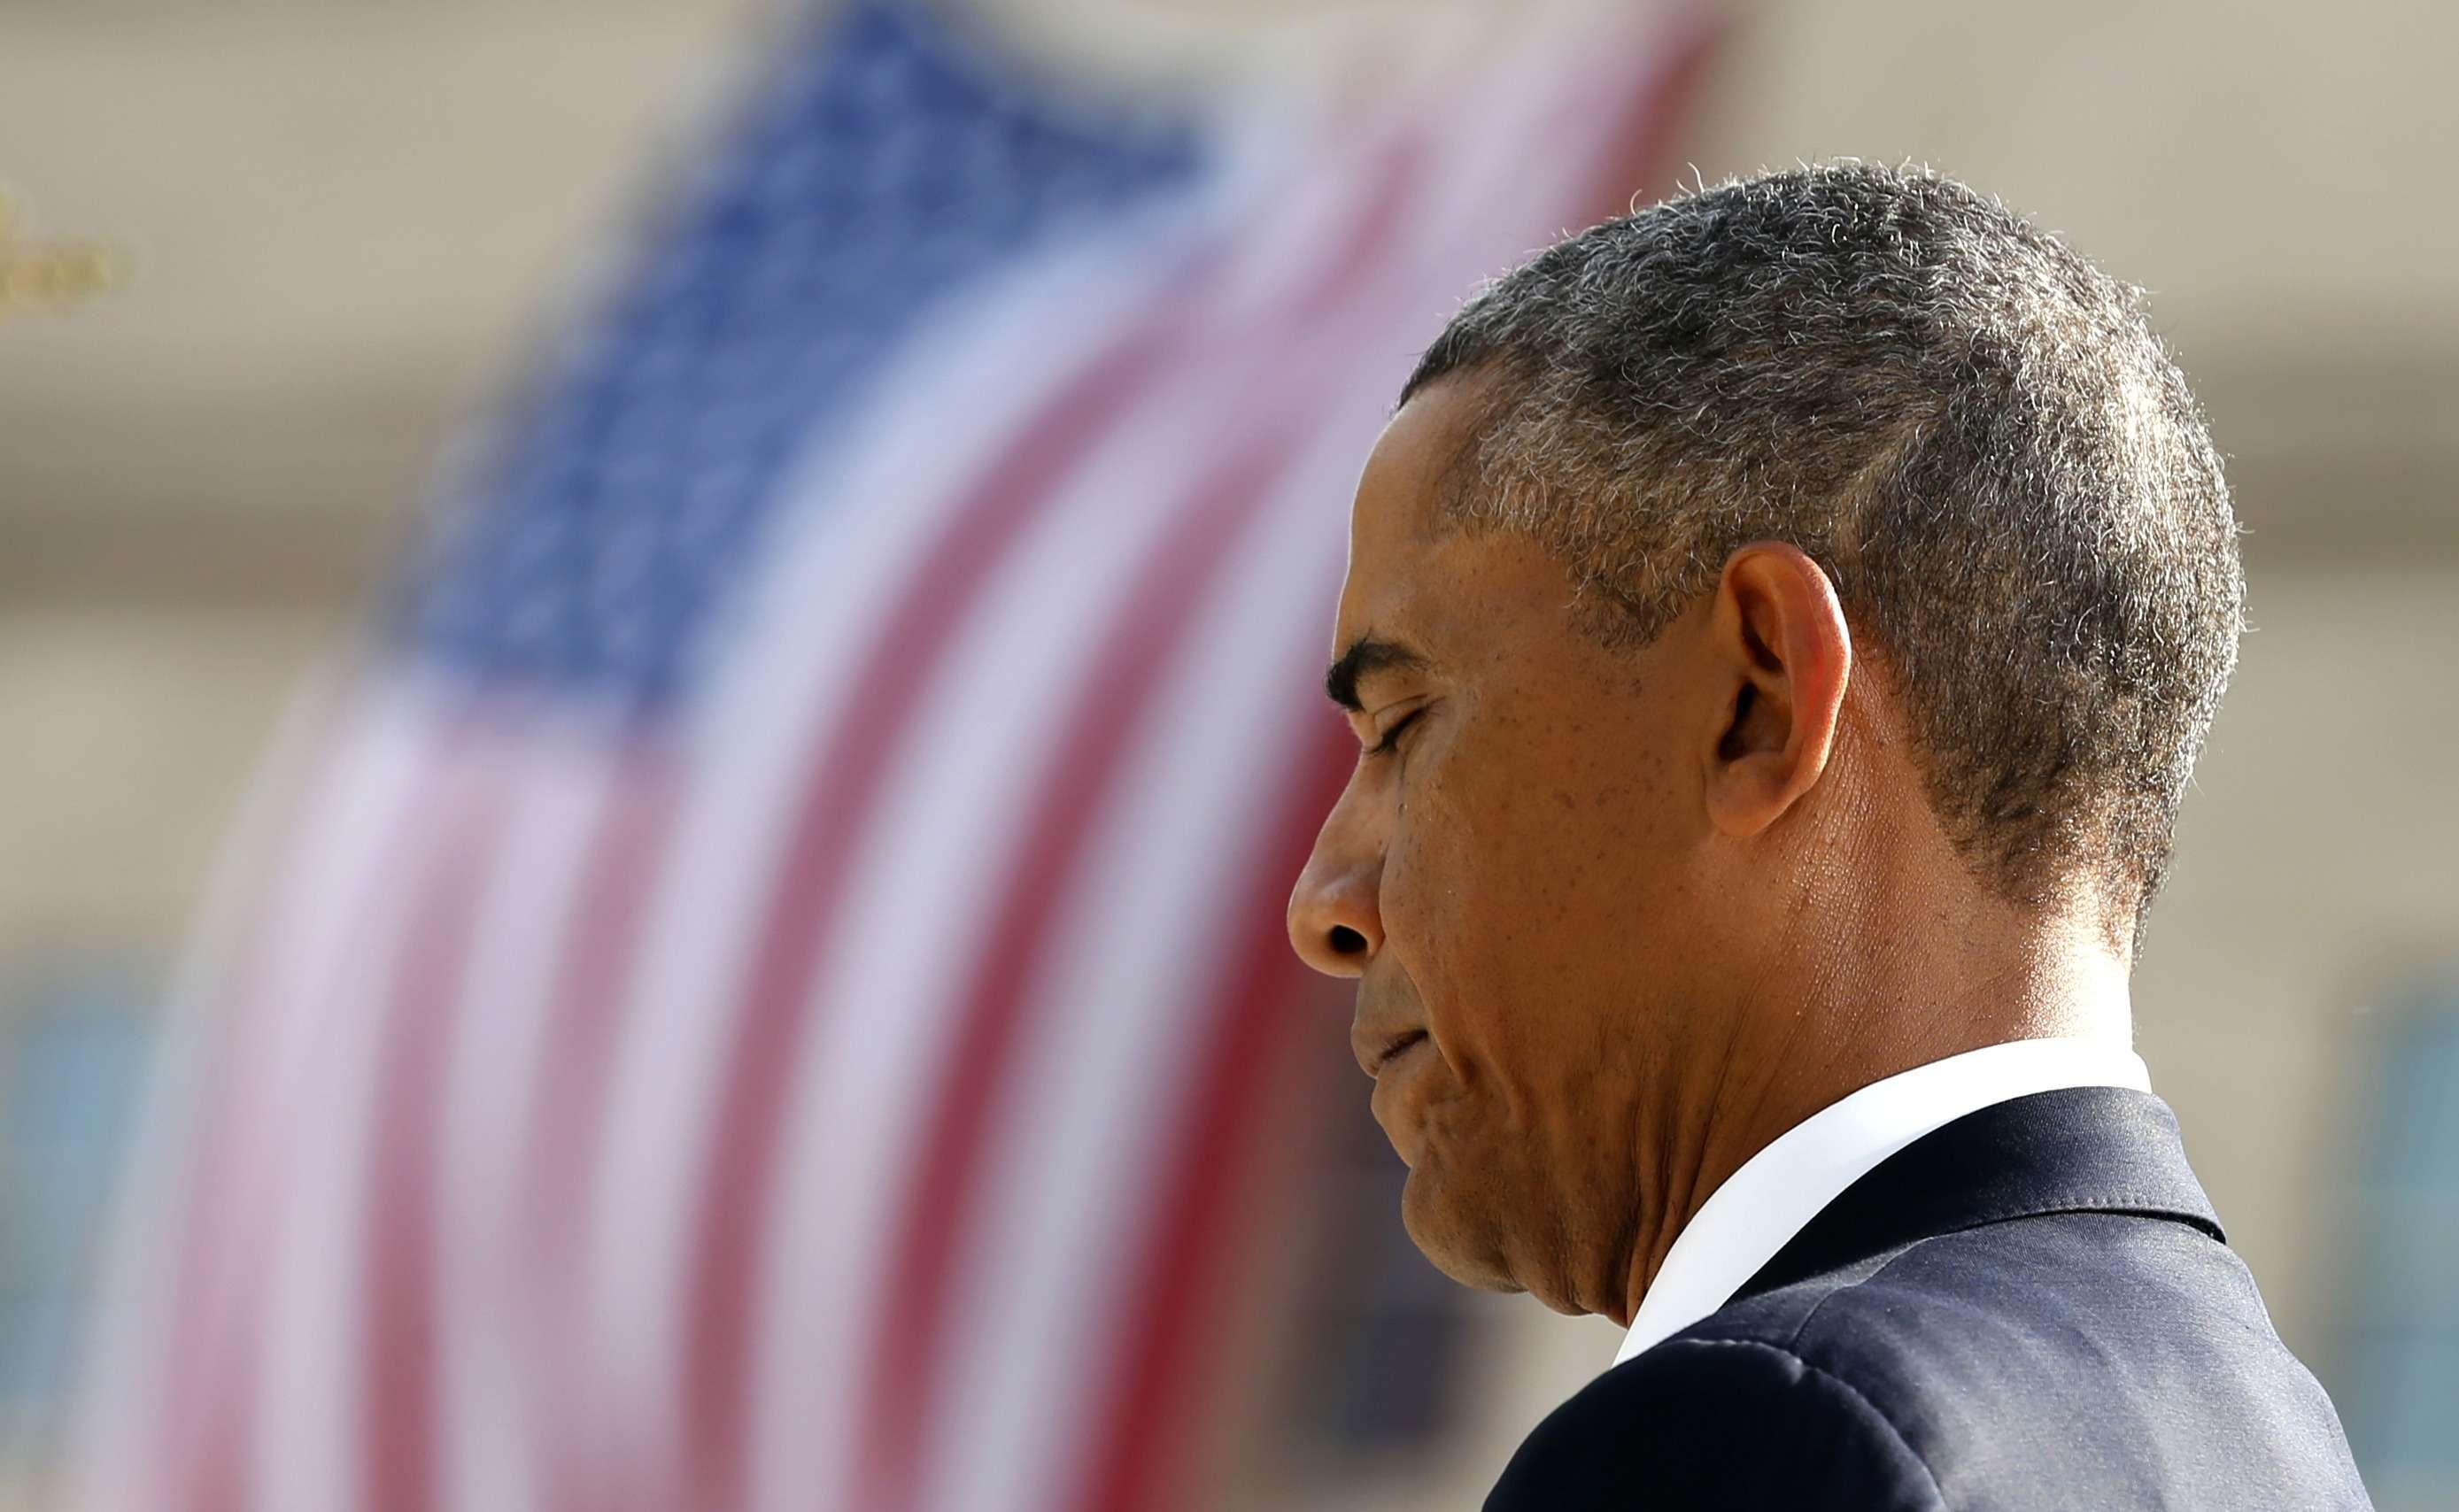 Foto: Kevin Lamarque/Reuters